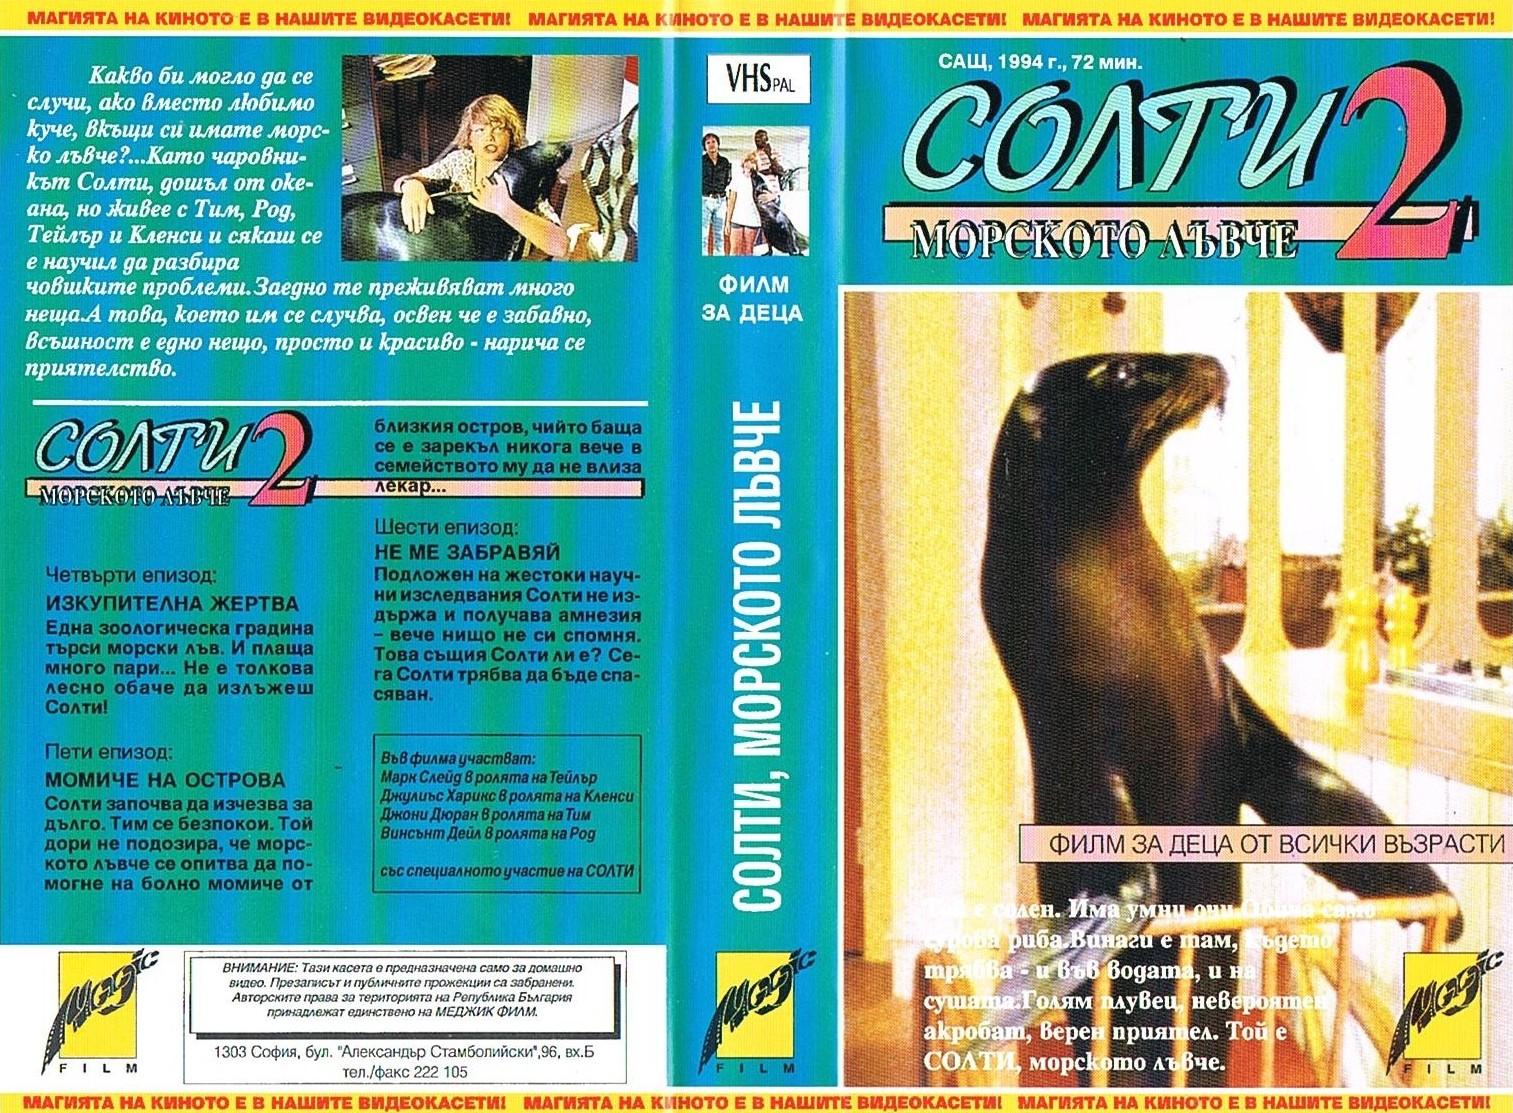 Солти морското лъвче филм постер